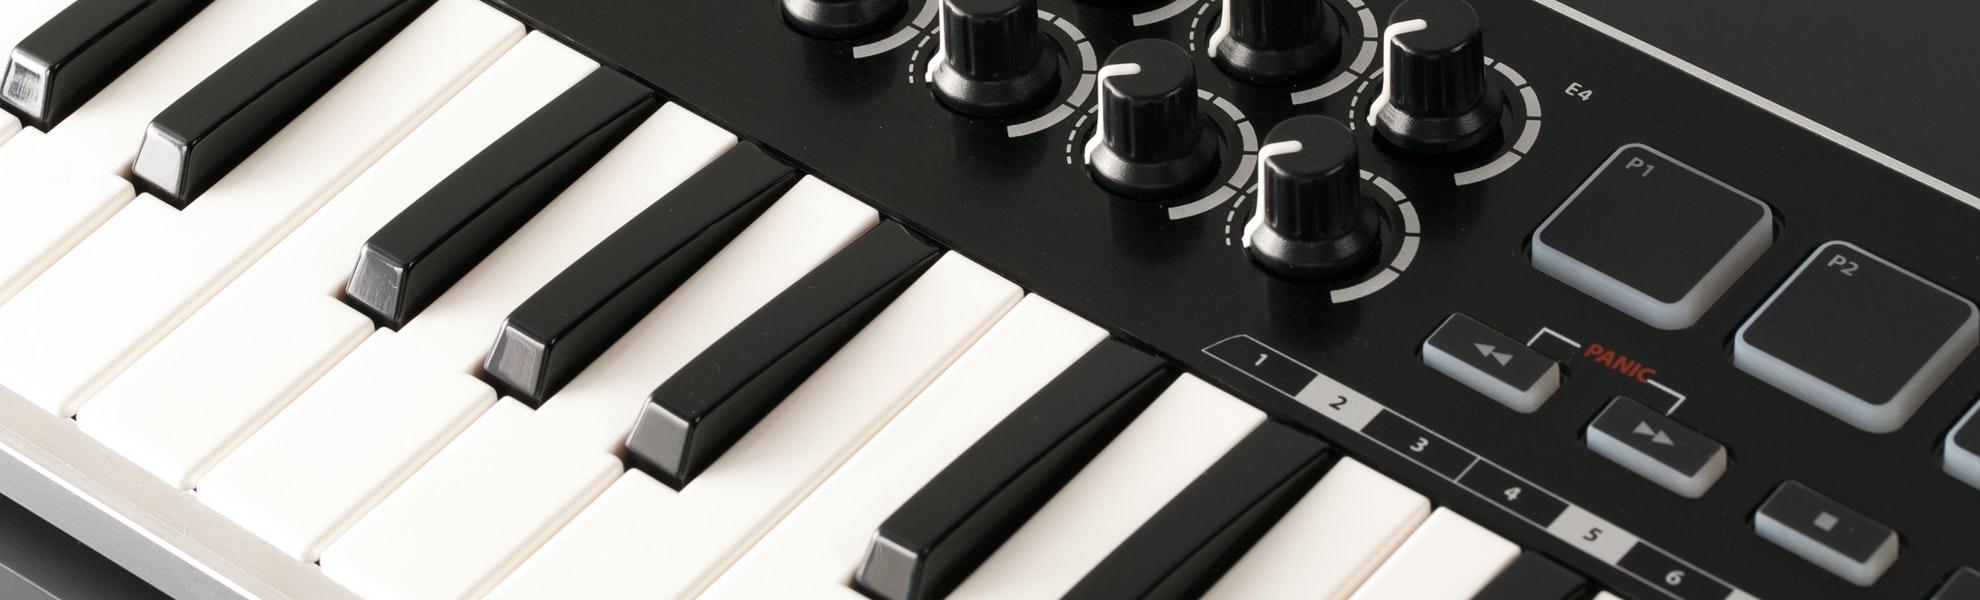 Samson Graphite M25 USB MIDI Controller